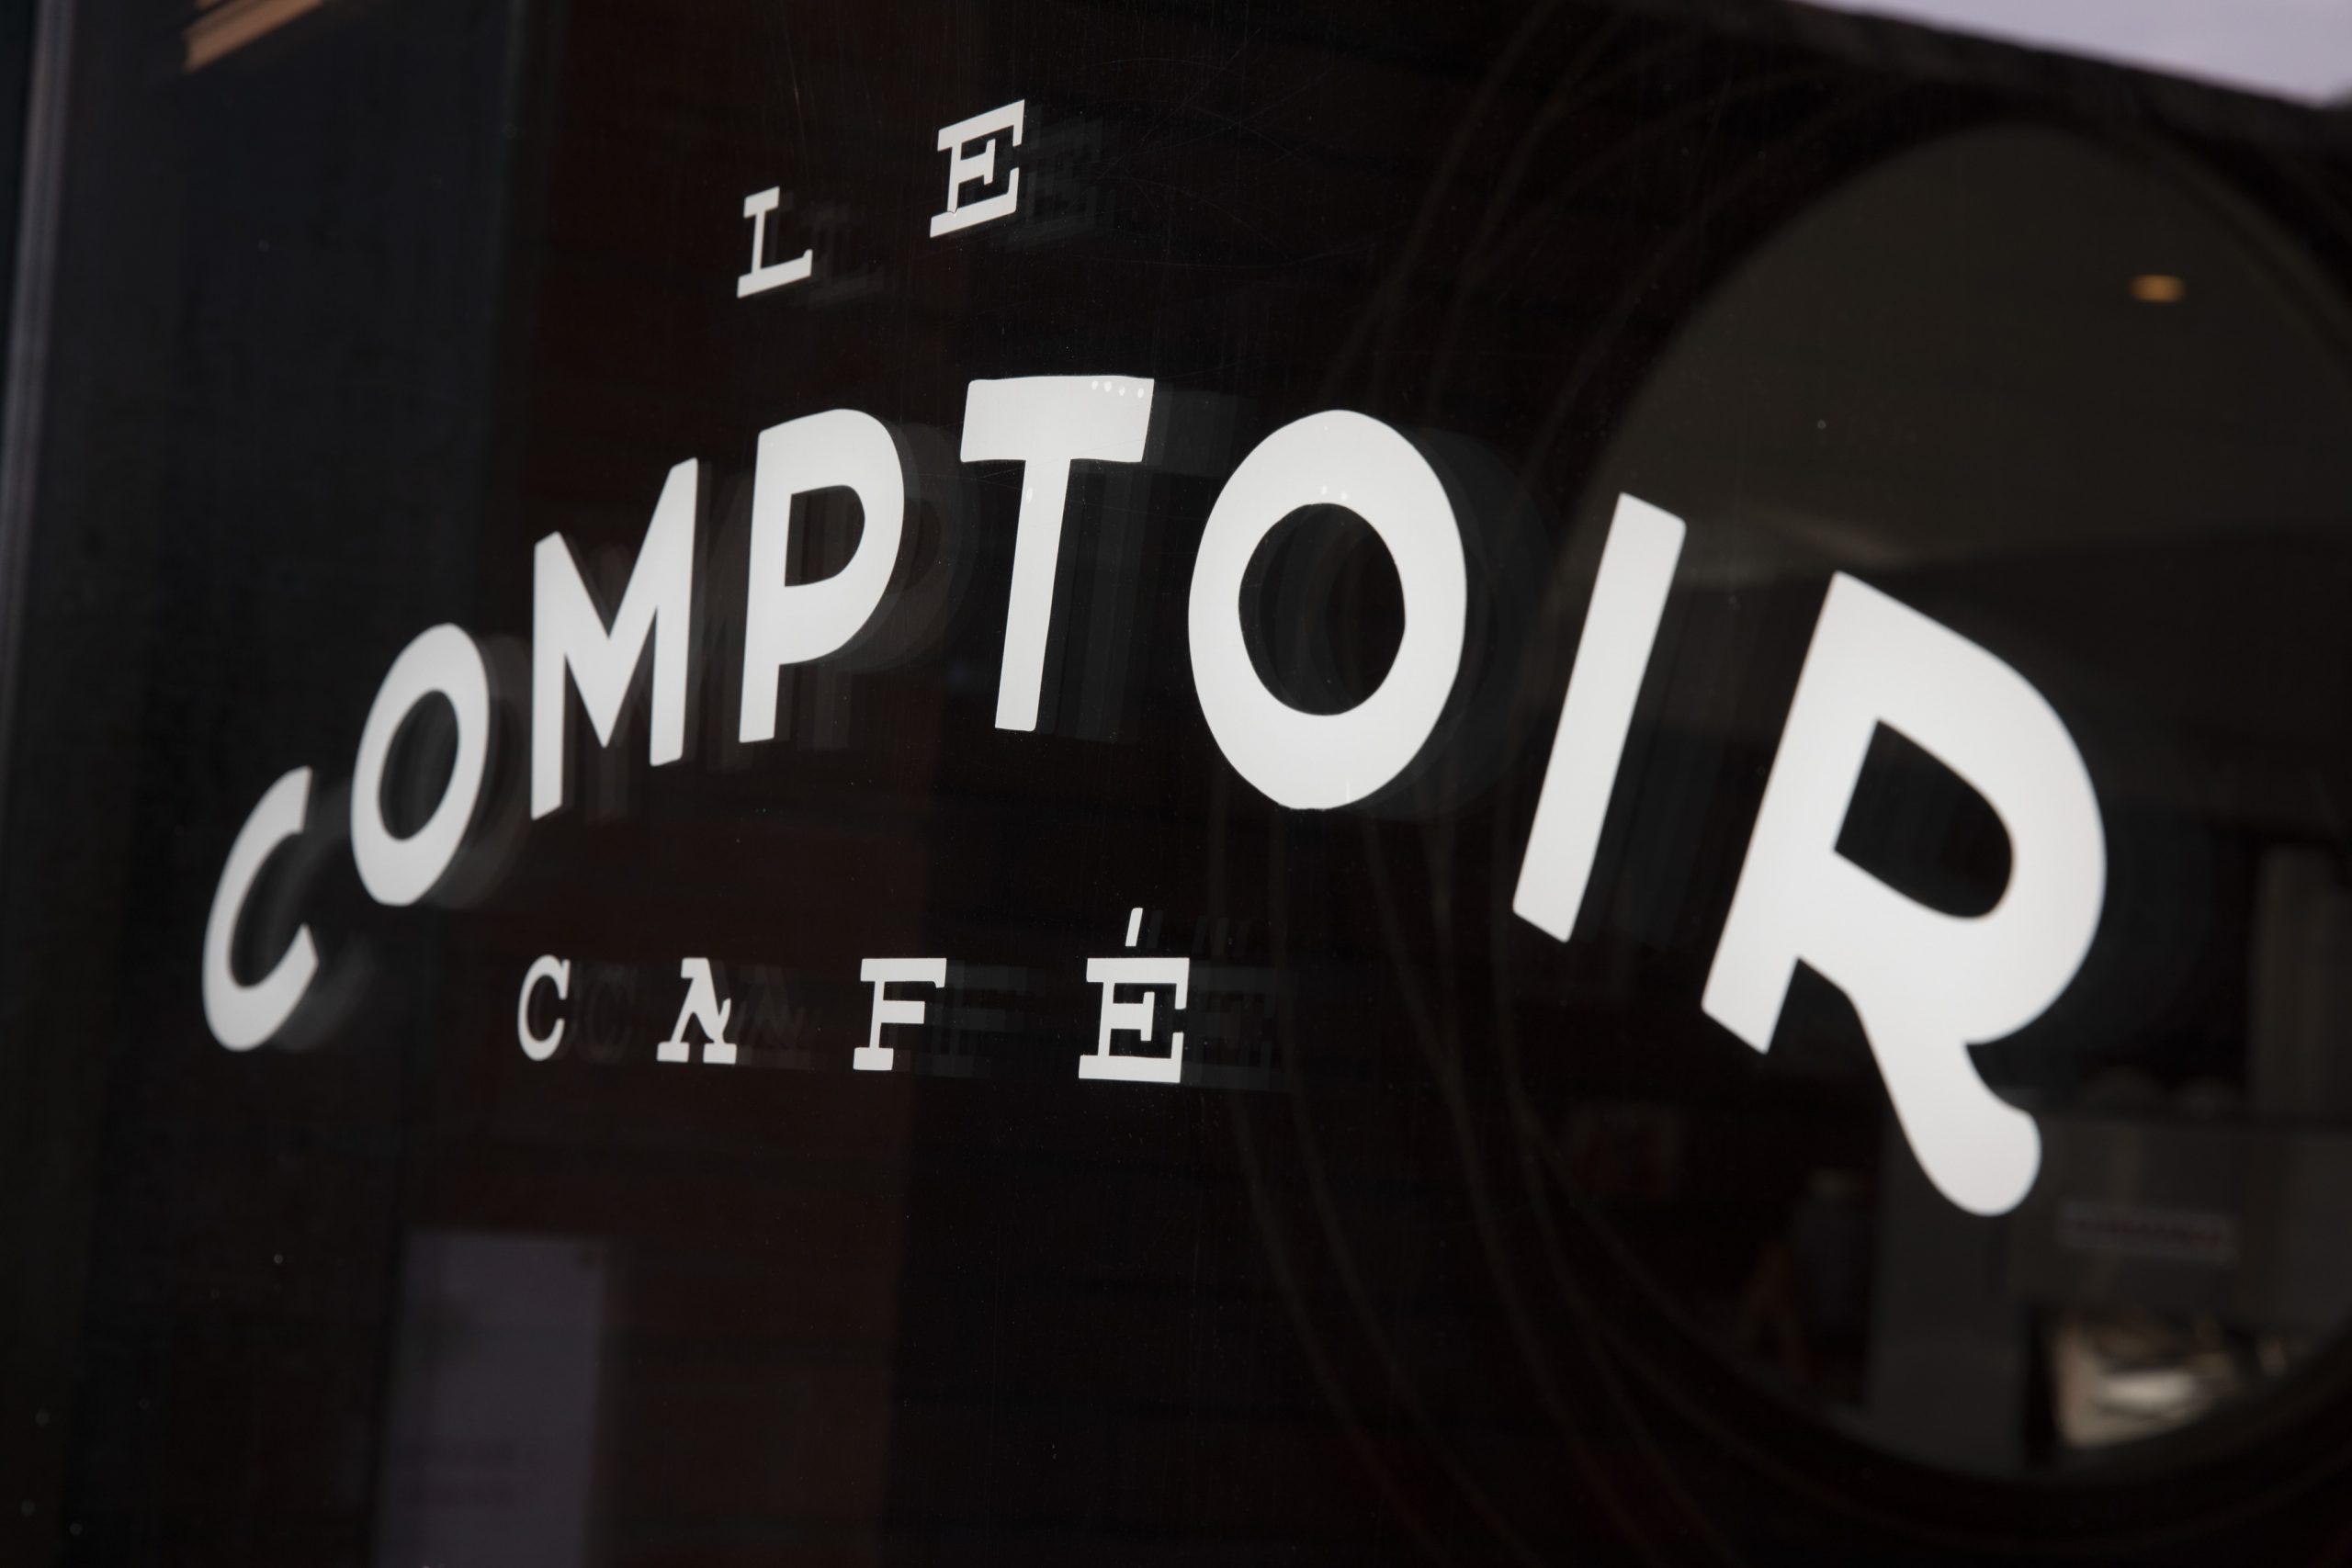 Le comptoir cafe